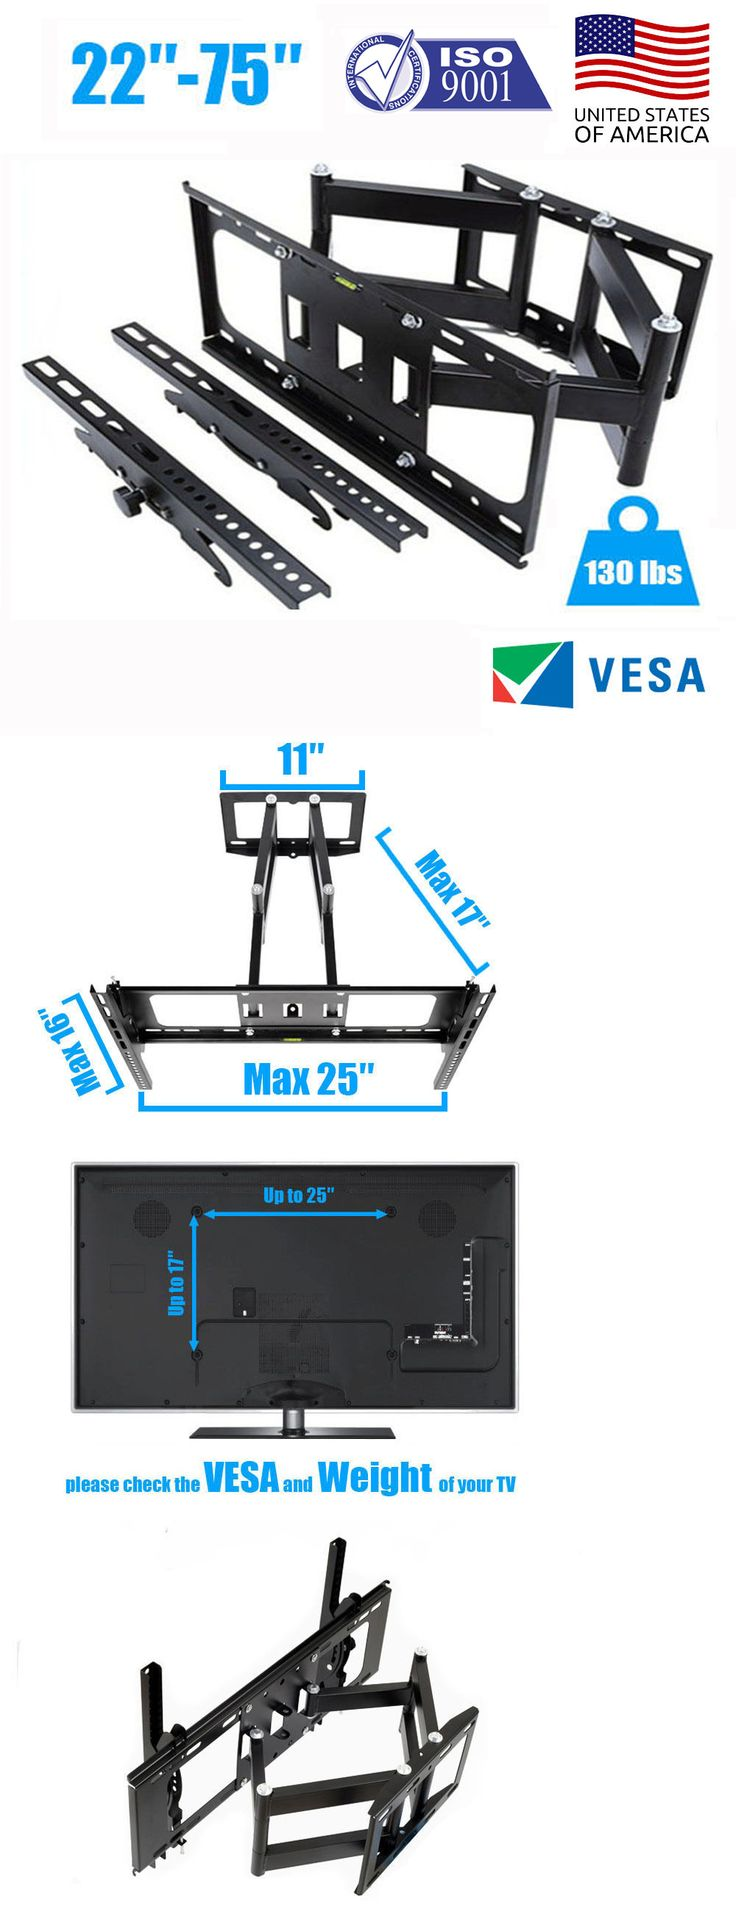 TV Mounts and Brackets: Flat Panel Tv Wall Mount Full Motion Tilt Swivel Samsung Lg Vizio Sony 22 75 -> BUY IT NOW ONLY: $37.99 on eBay!